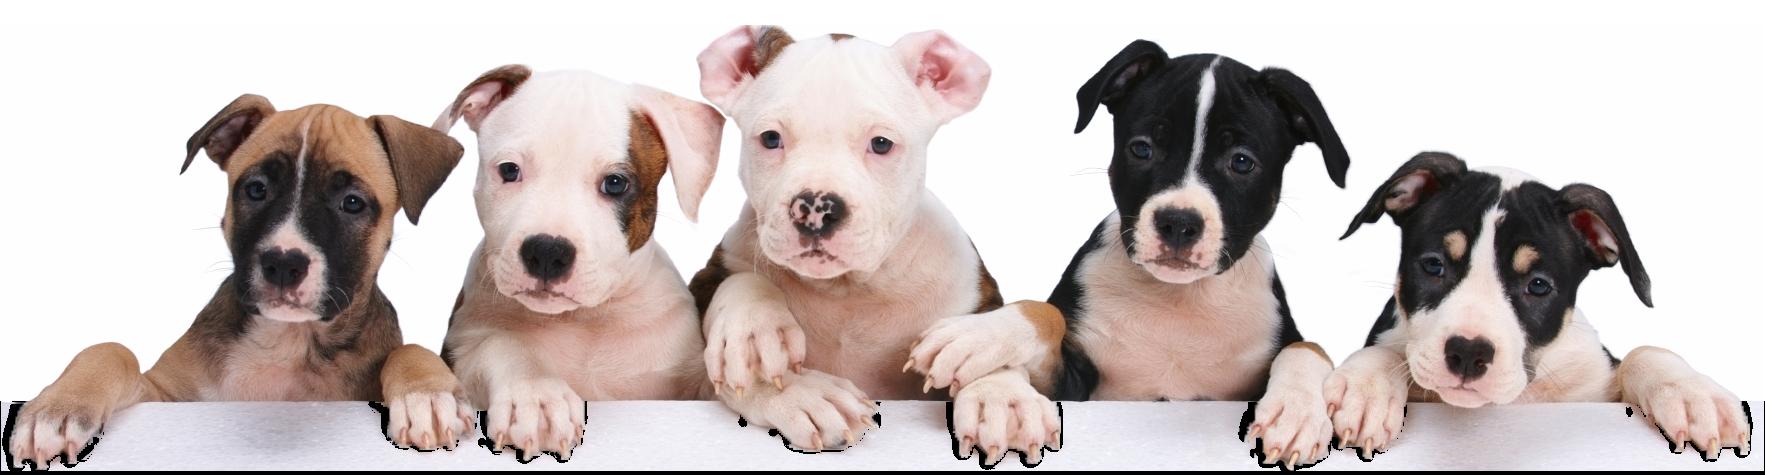 Petland Chicago Ridge Puppy Package Value